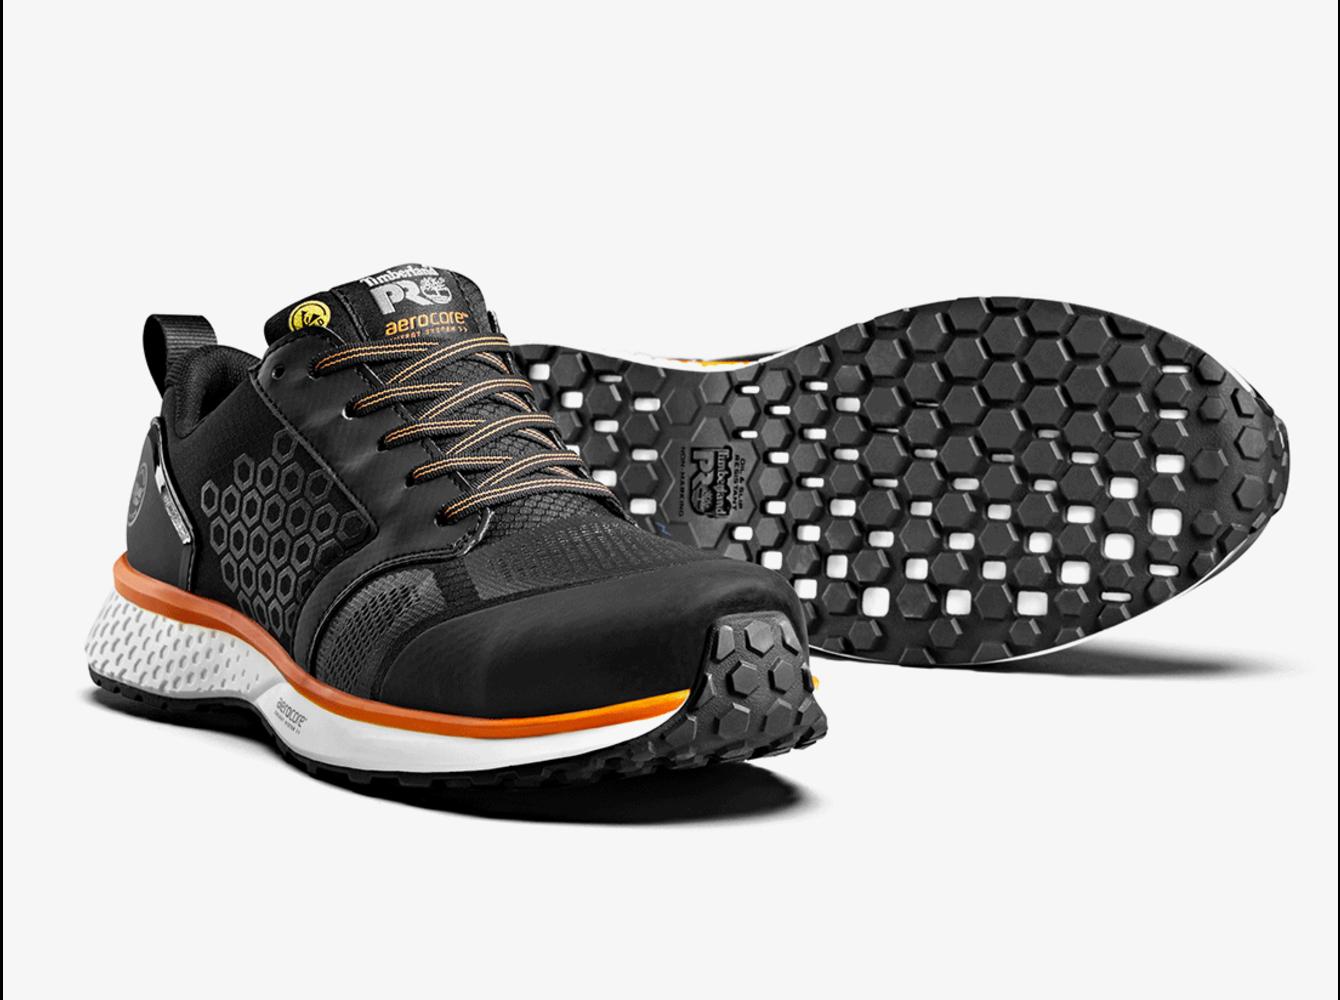 Timberland PRO® Reaxion Trainer Black-Orange S3